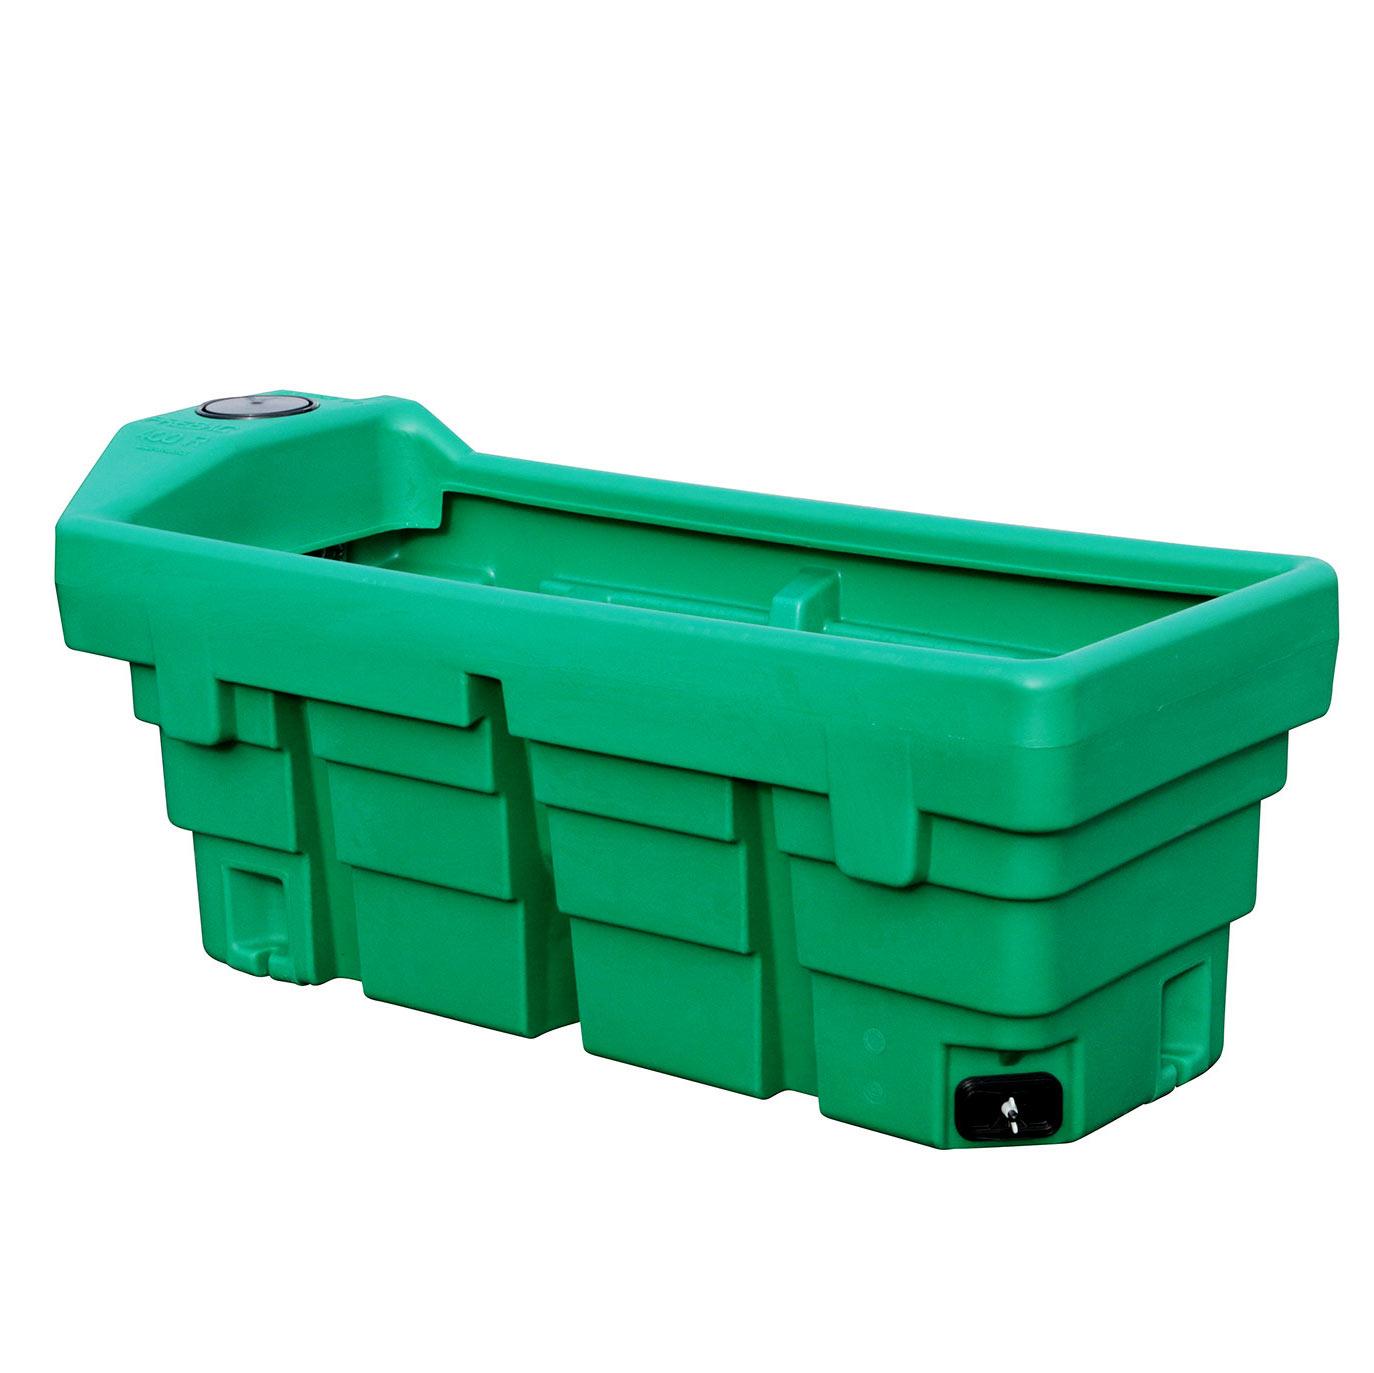 Bac de pâture rectangulaire PREBAC 400 litres